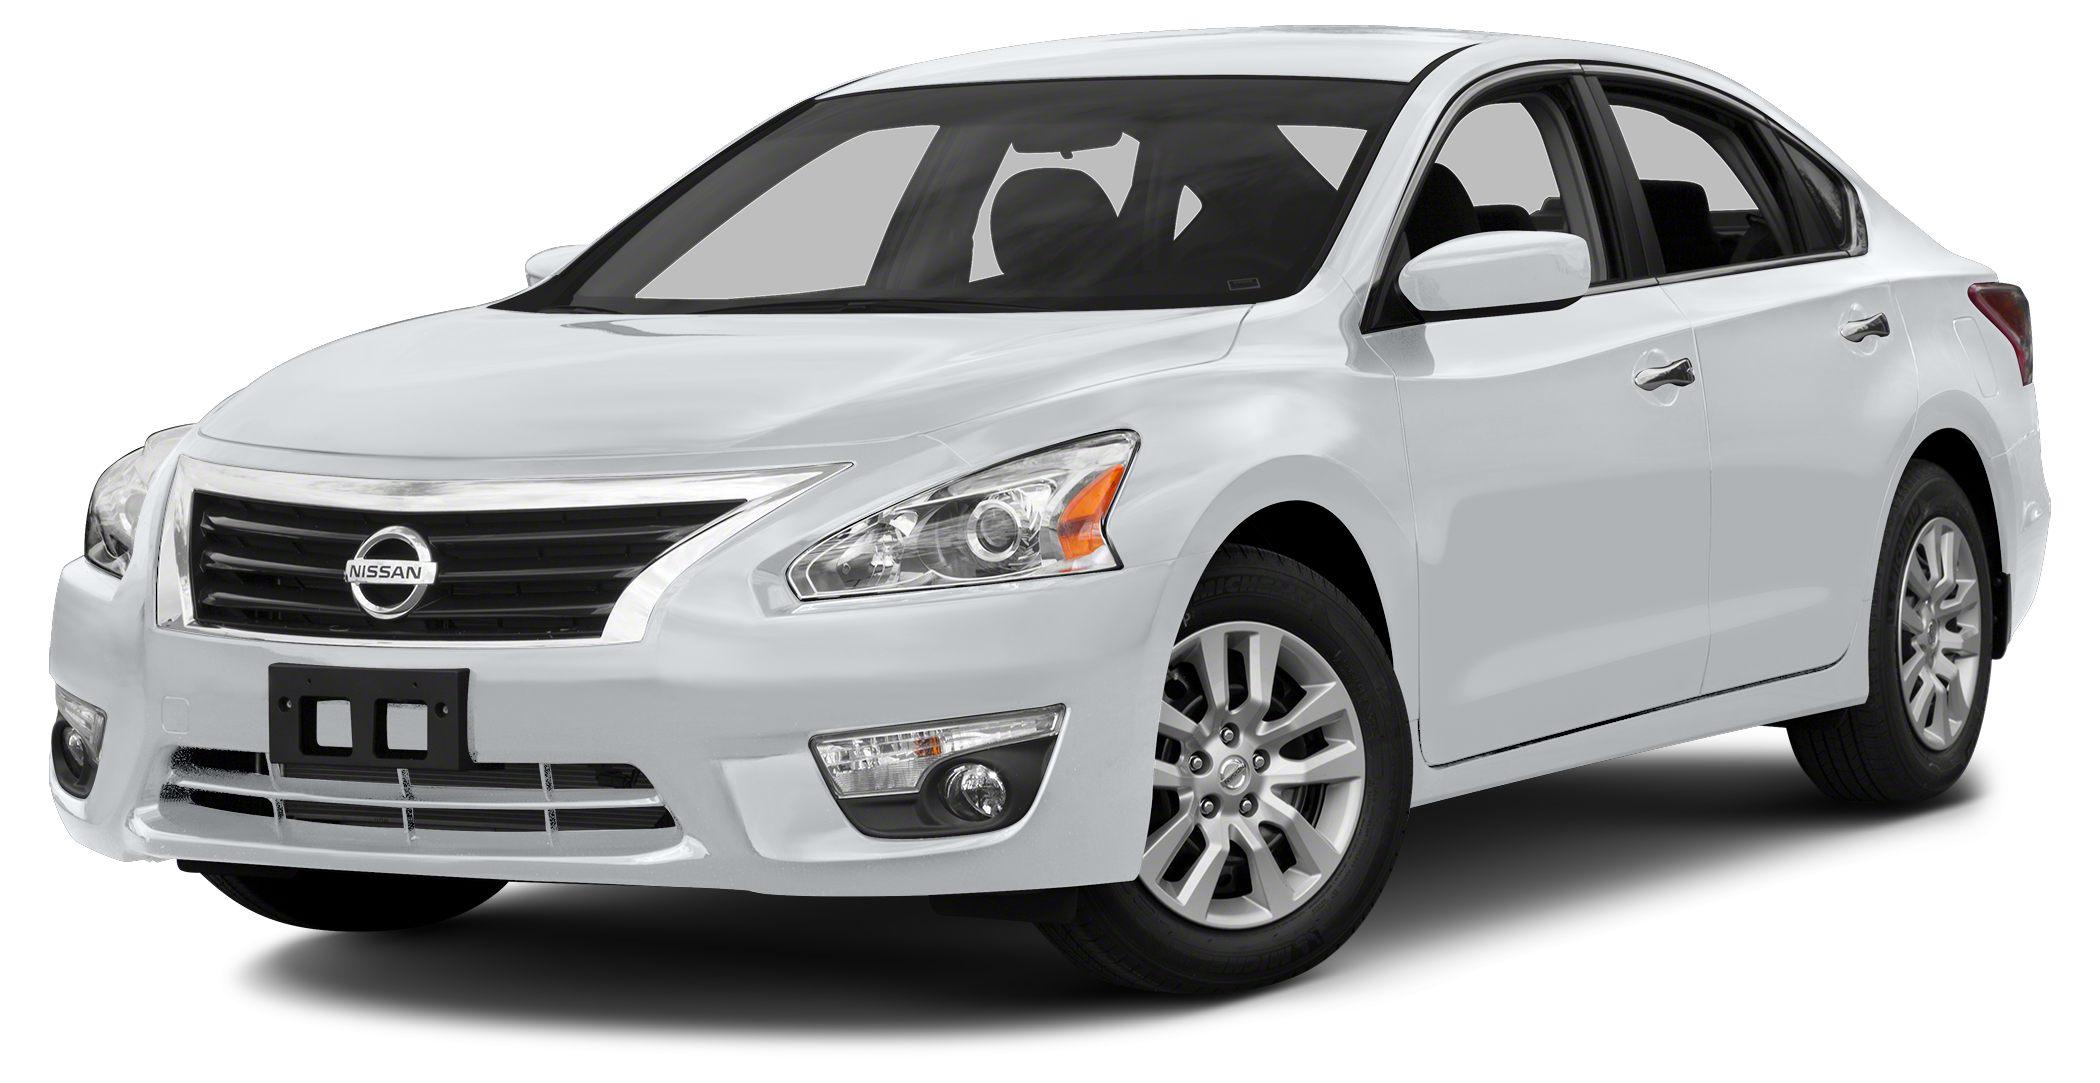 2015 Nissan Altima 25 S Miles 24049Color Solid White Stock NR1649 VIN 1N4AL3AP7FN405413